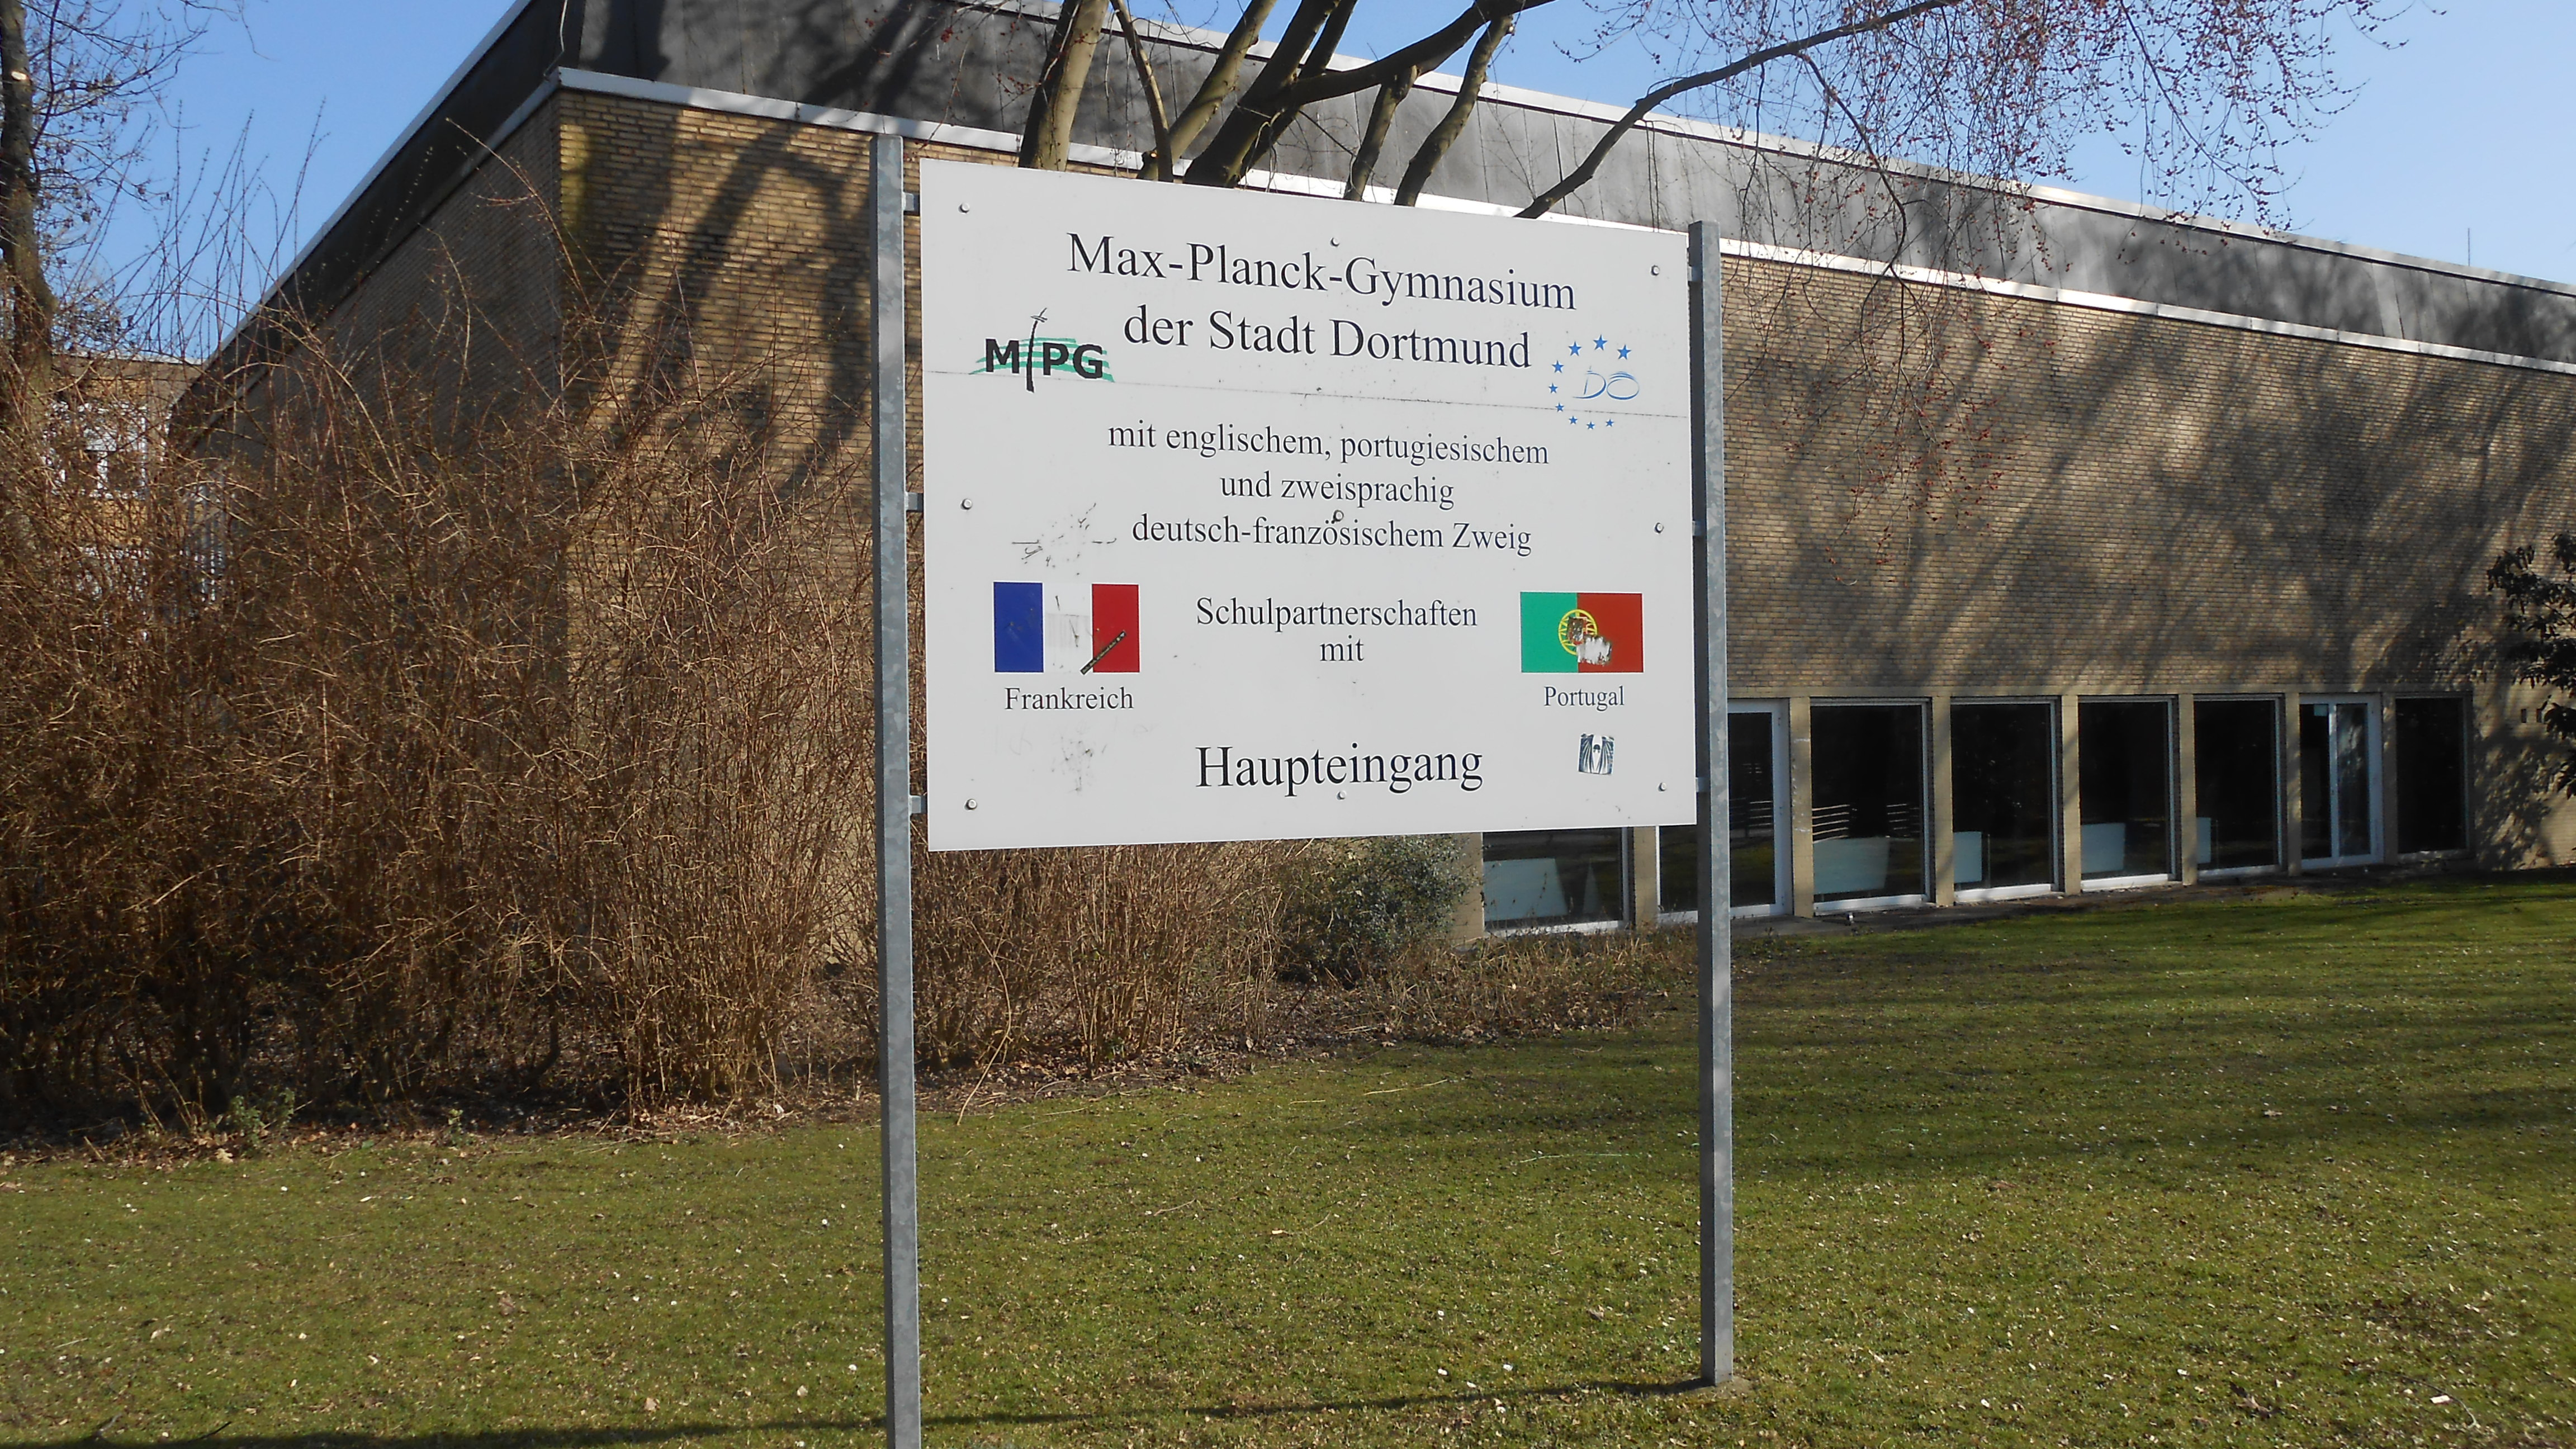 Max-Planck-Gymnasium Dortmund